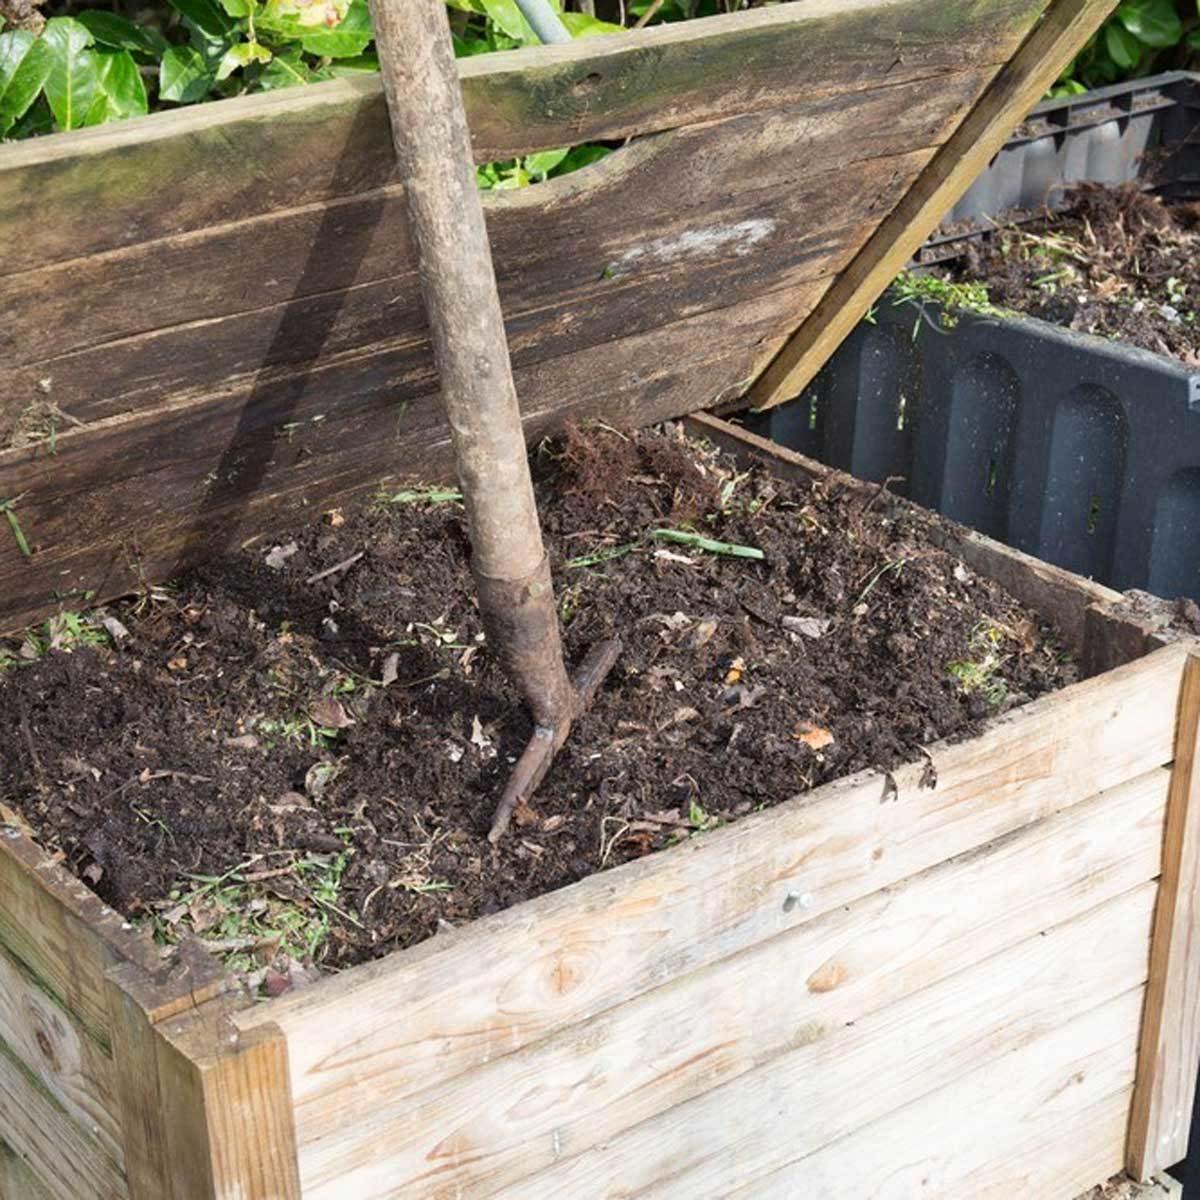 dfh17sep038_614626340_10-1200x1200 composting bin